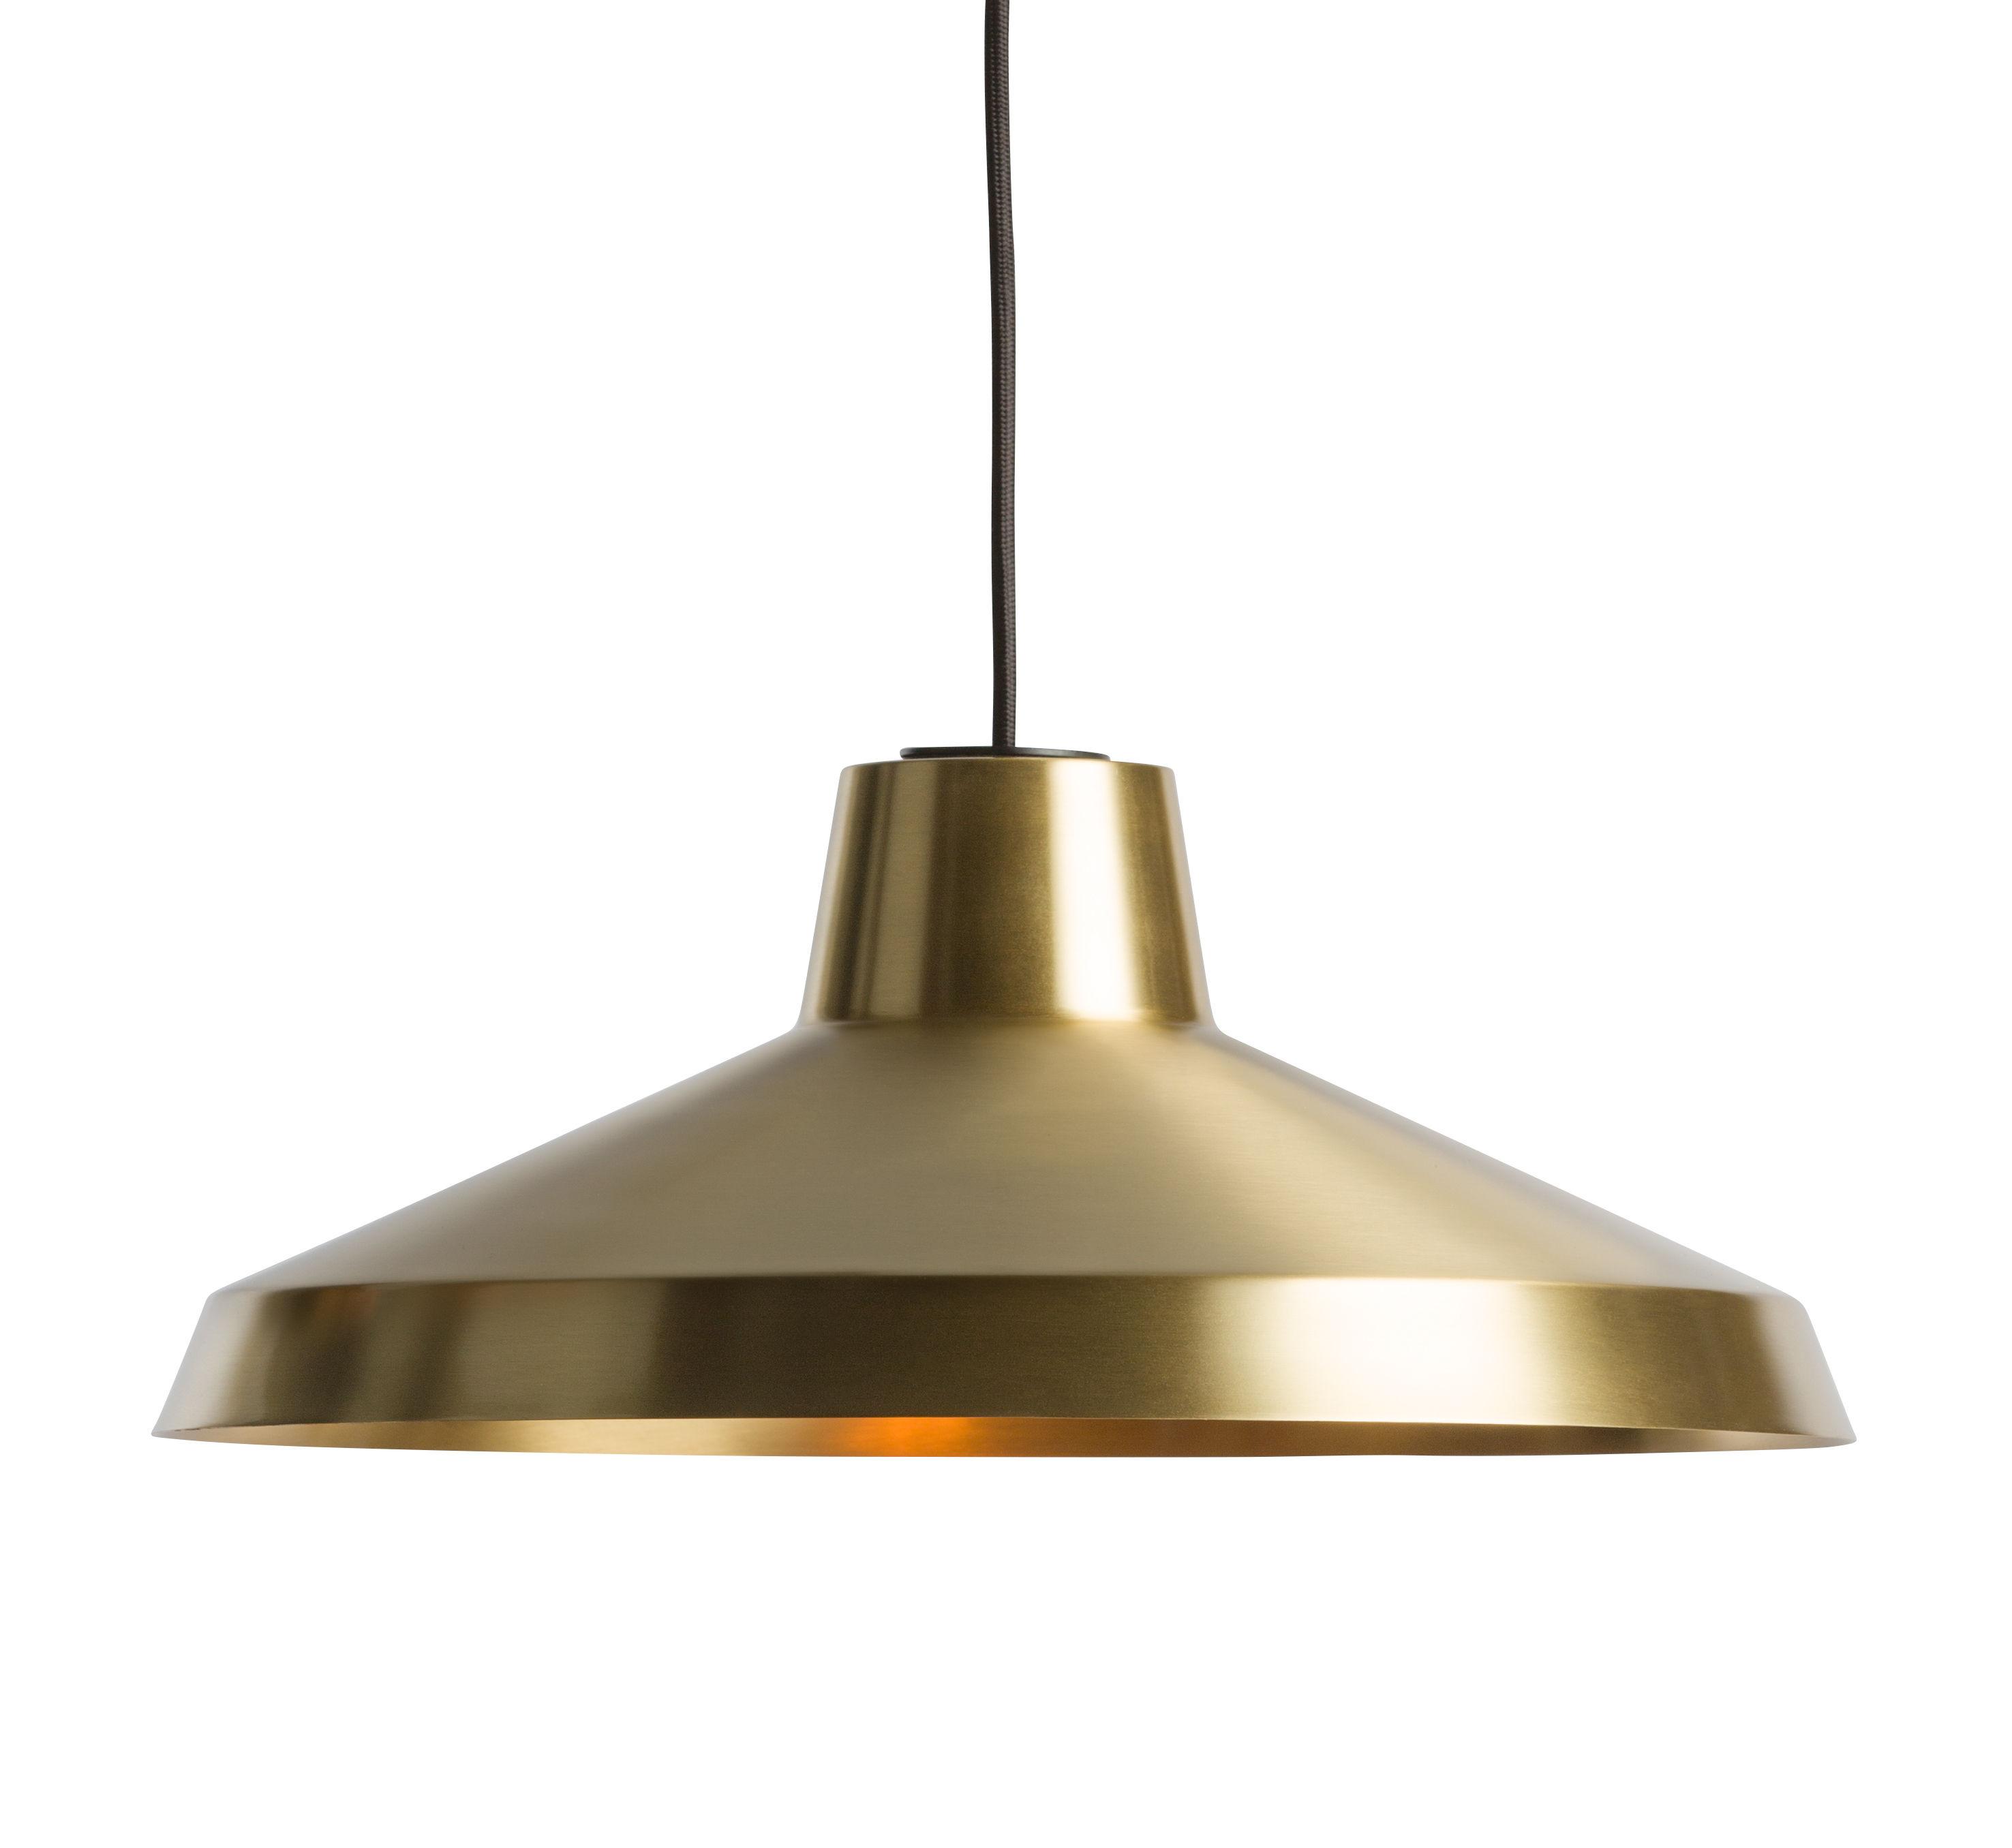 Lighting - Pendant Lighting - Evergreen Large Pendant - Ø 40 cm / Brass by Northern  - Brass - Brushed brass